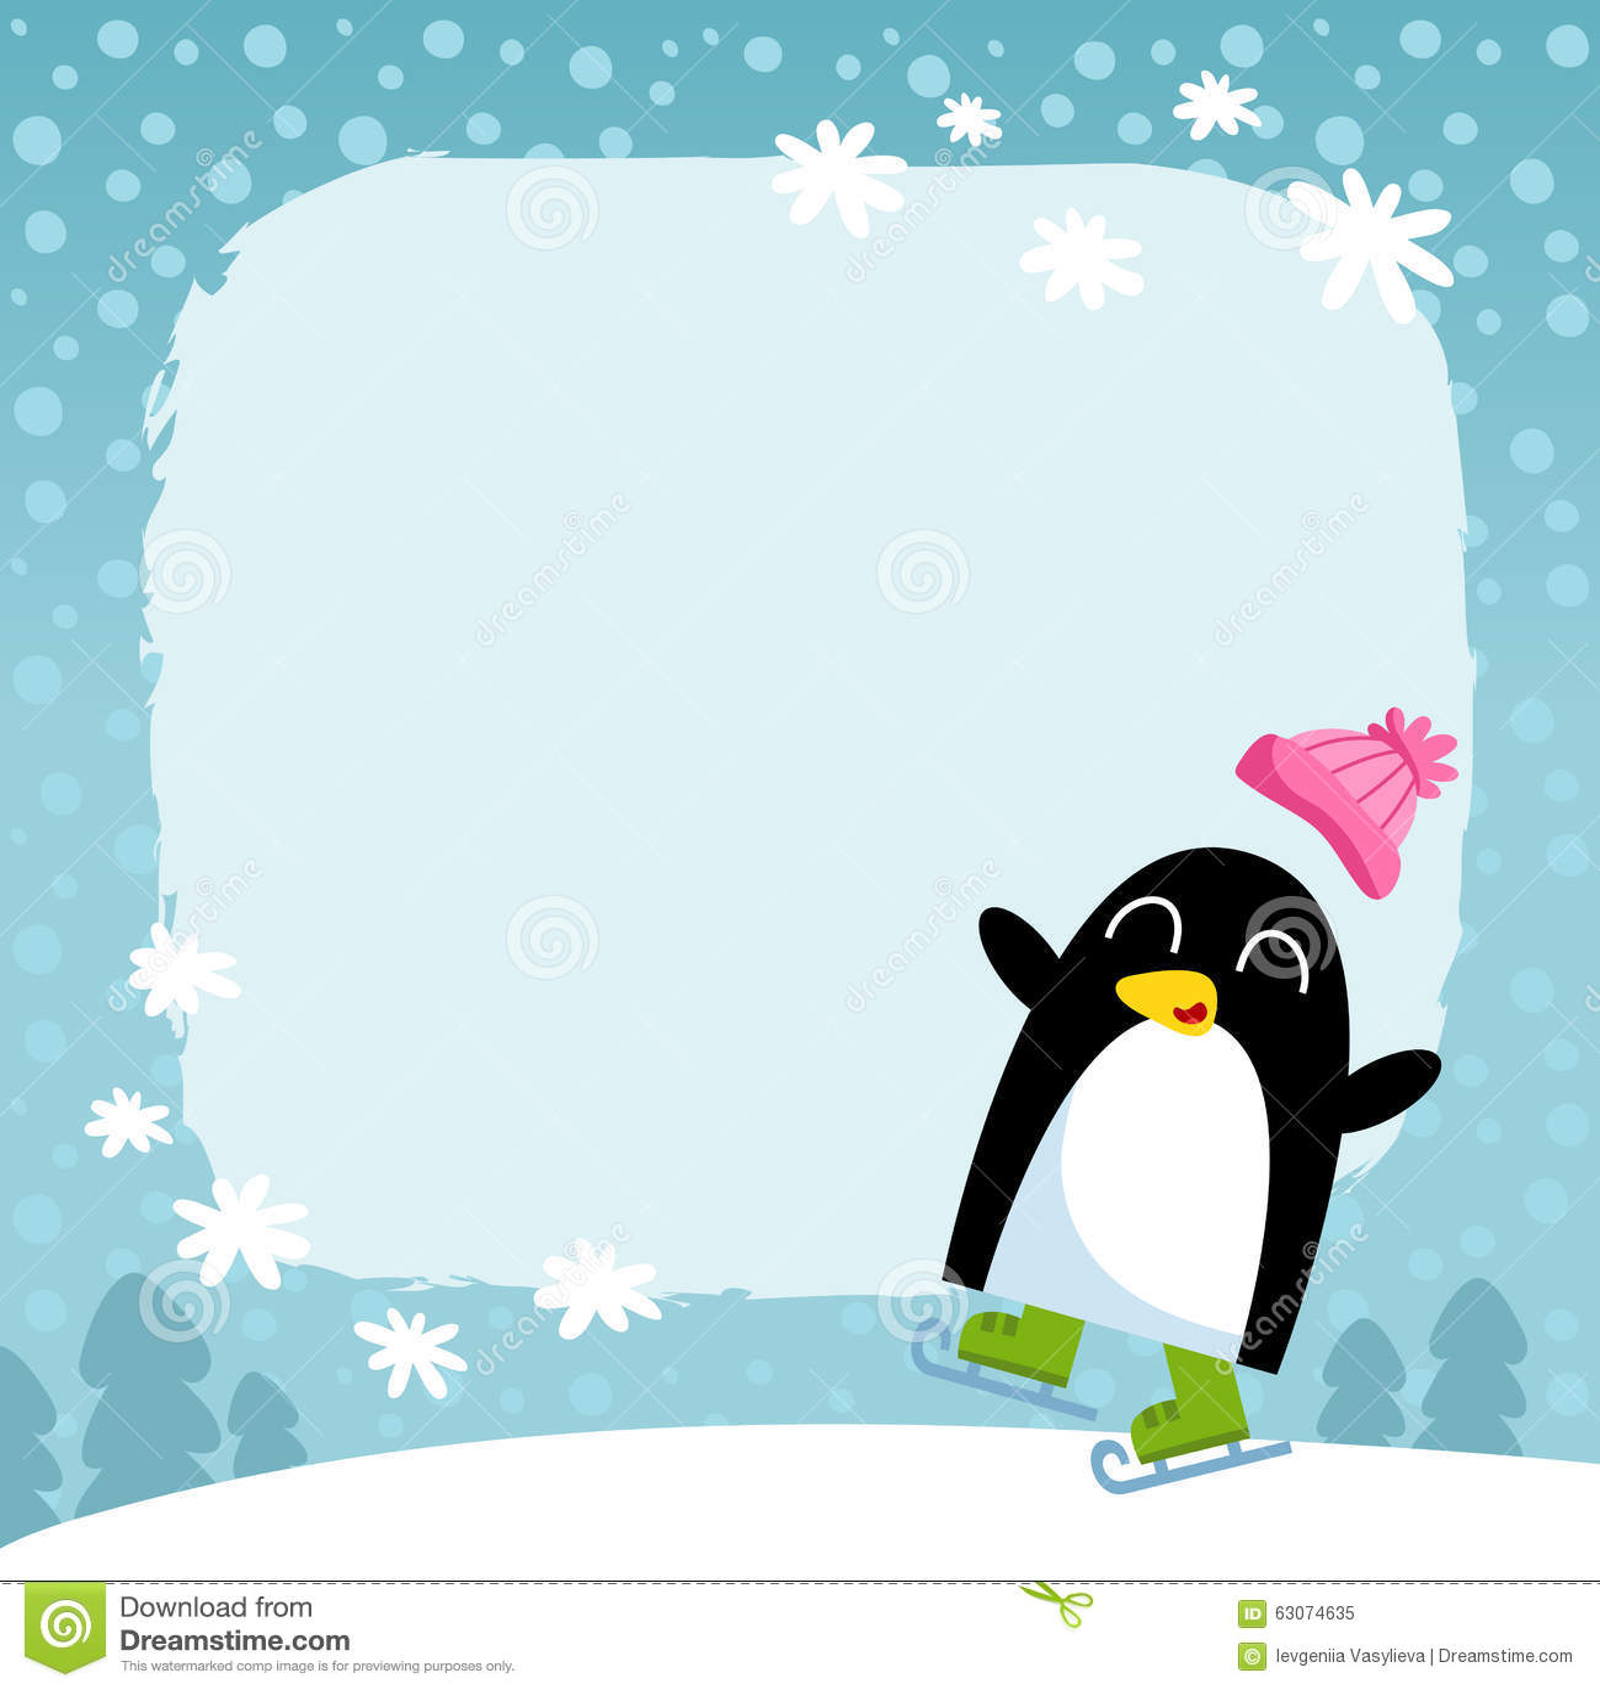 ppt冬天背景卡通图片展示图片